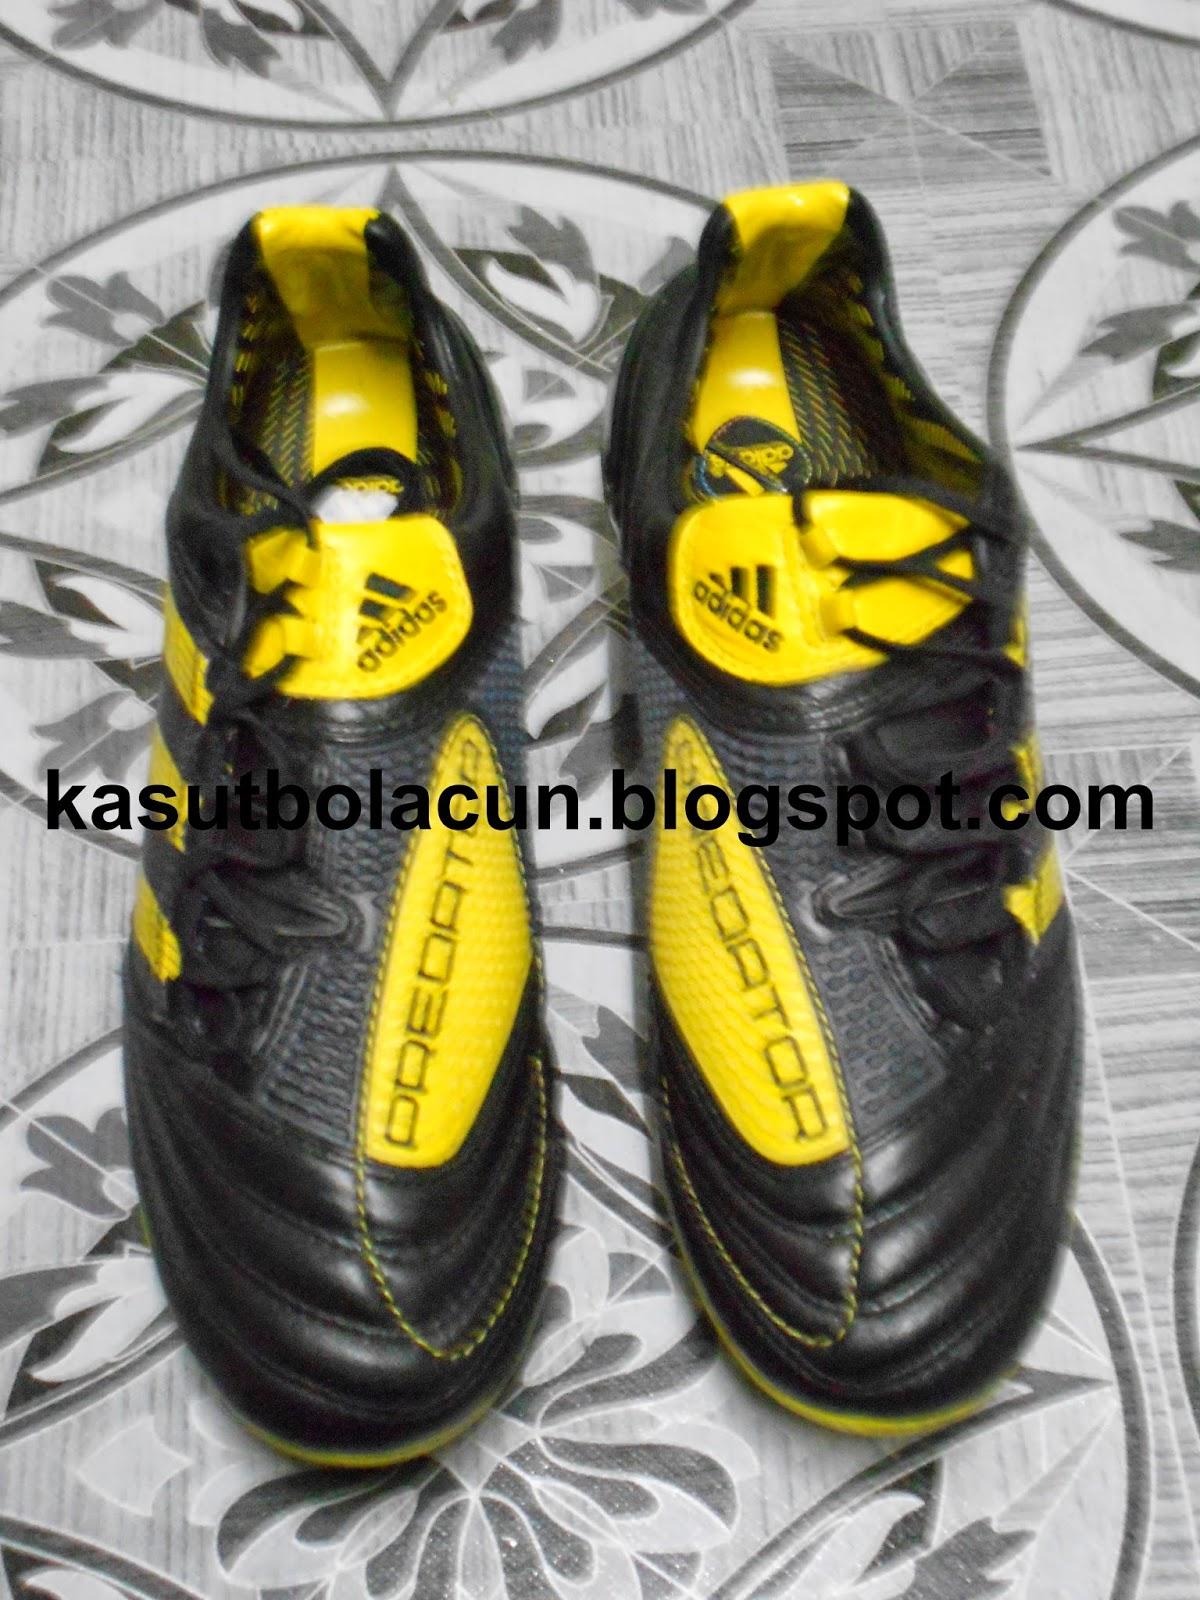 http://kasutbolacun.blogspot.com/2015/01/adidas-predator-x-fg_19.html